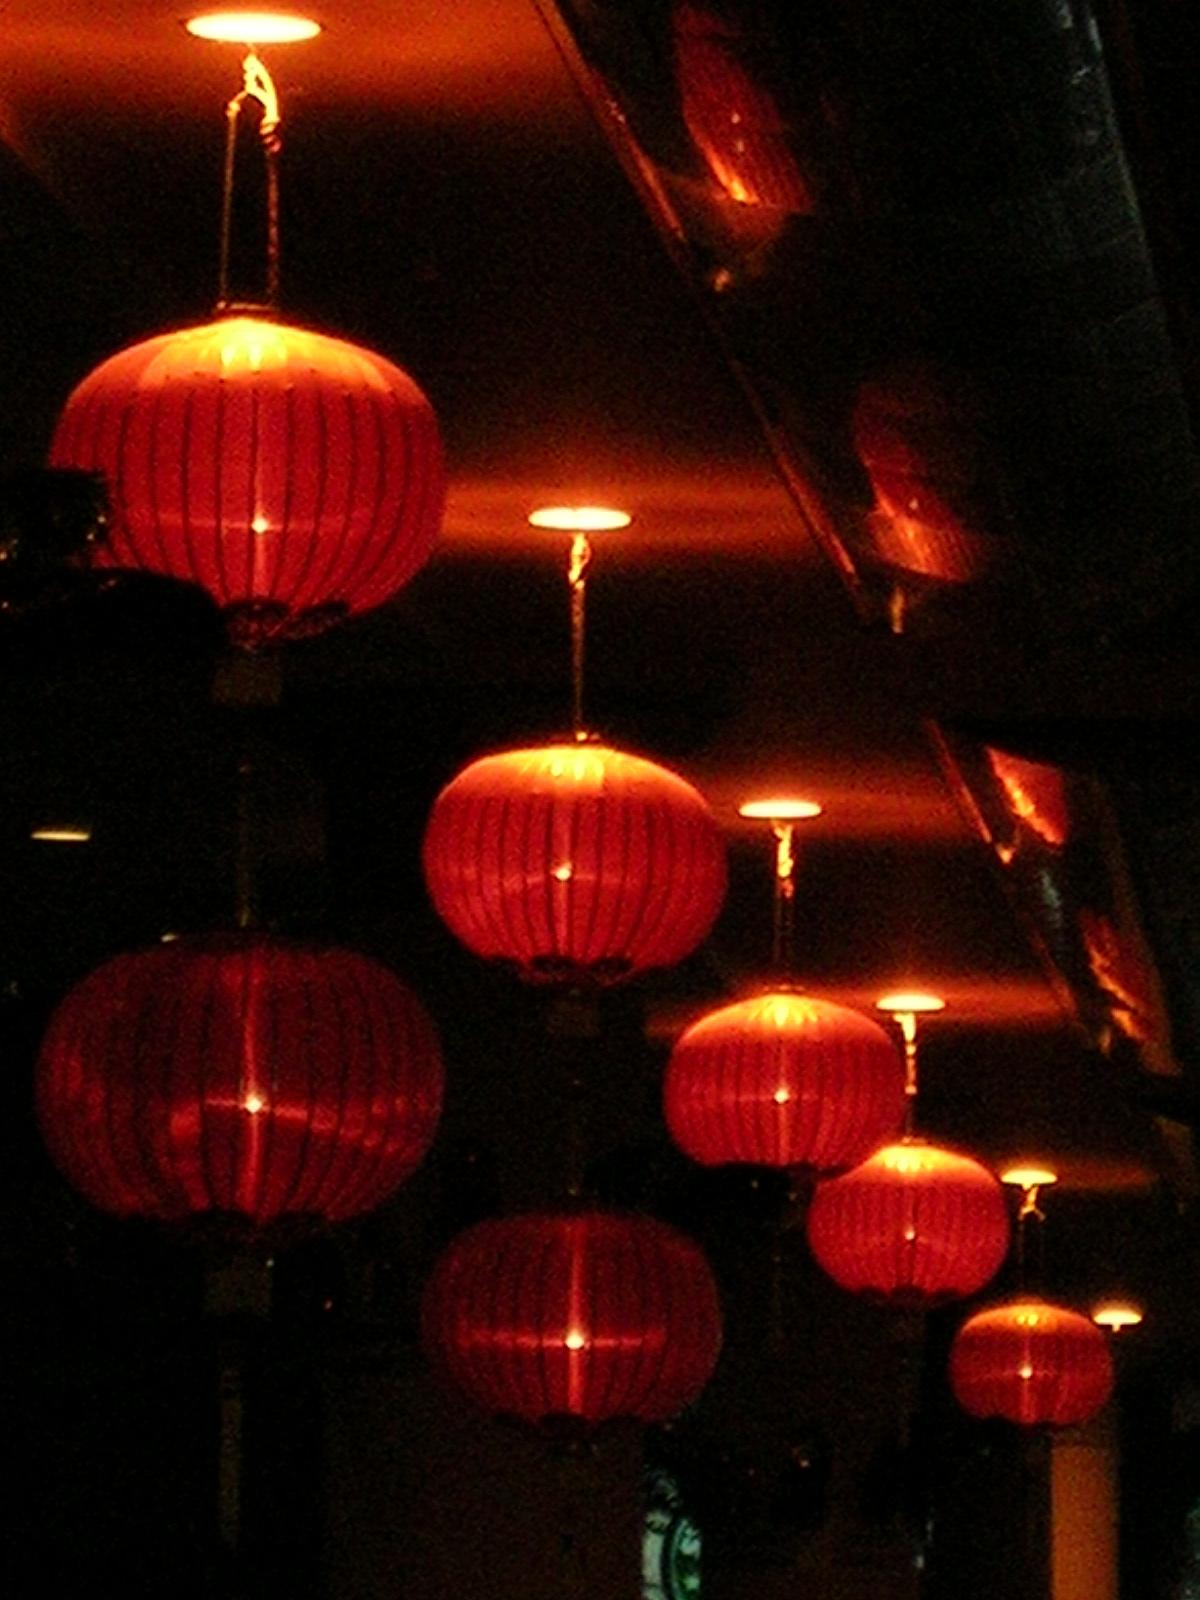 https://i2.wp.com/upload.wikimedia.org/wikipedia/commons/9/9e/Red_lanterns.JPG